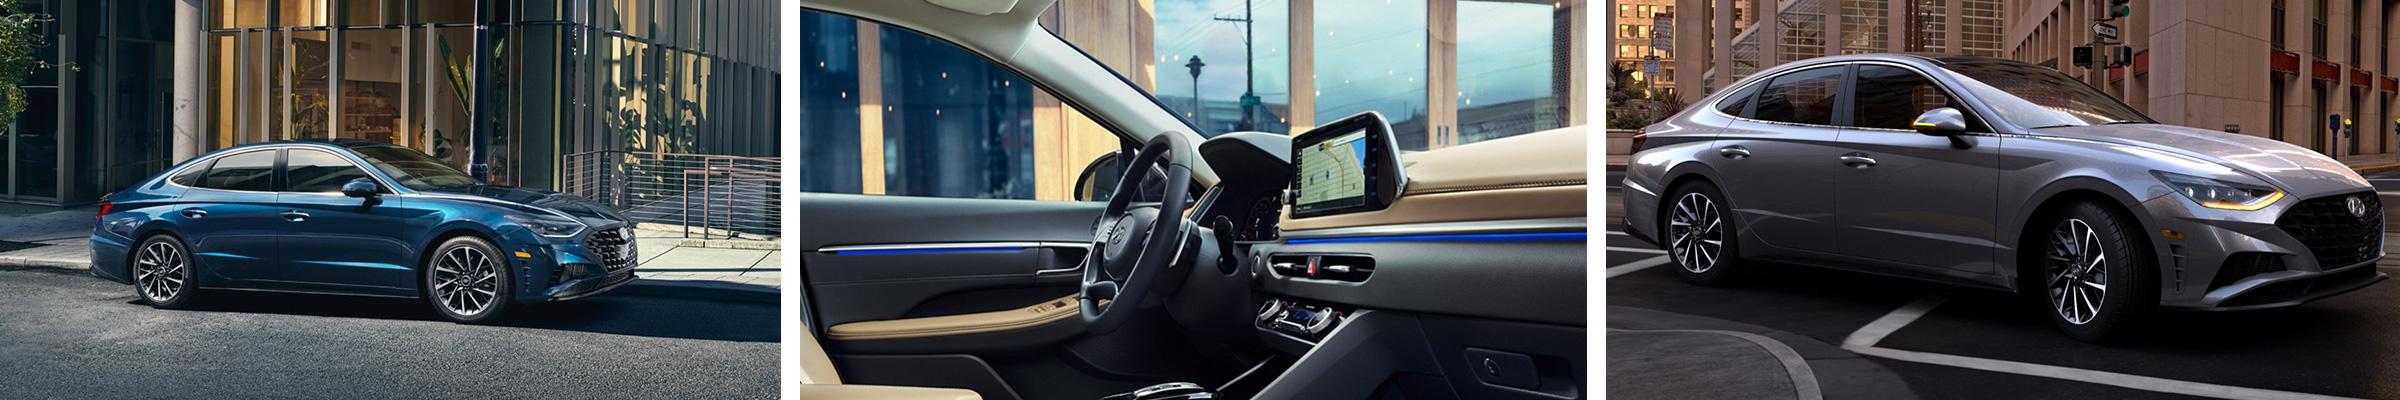 2021 Hyundai Sonata For Sale Dearborn MI | Detroit